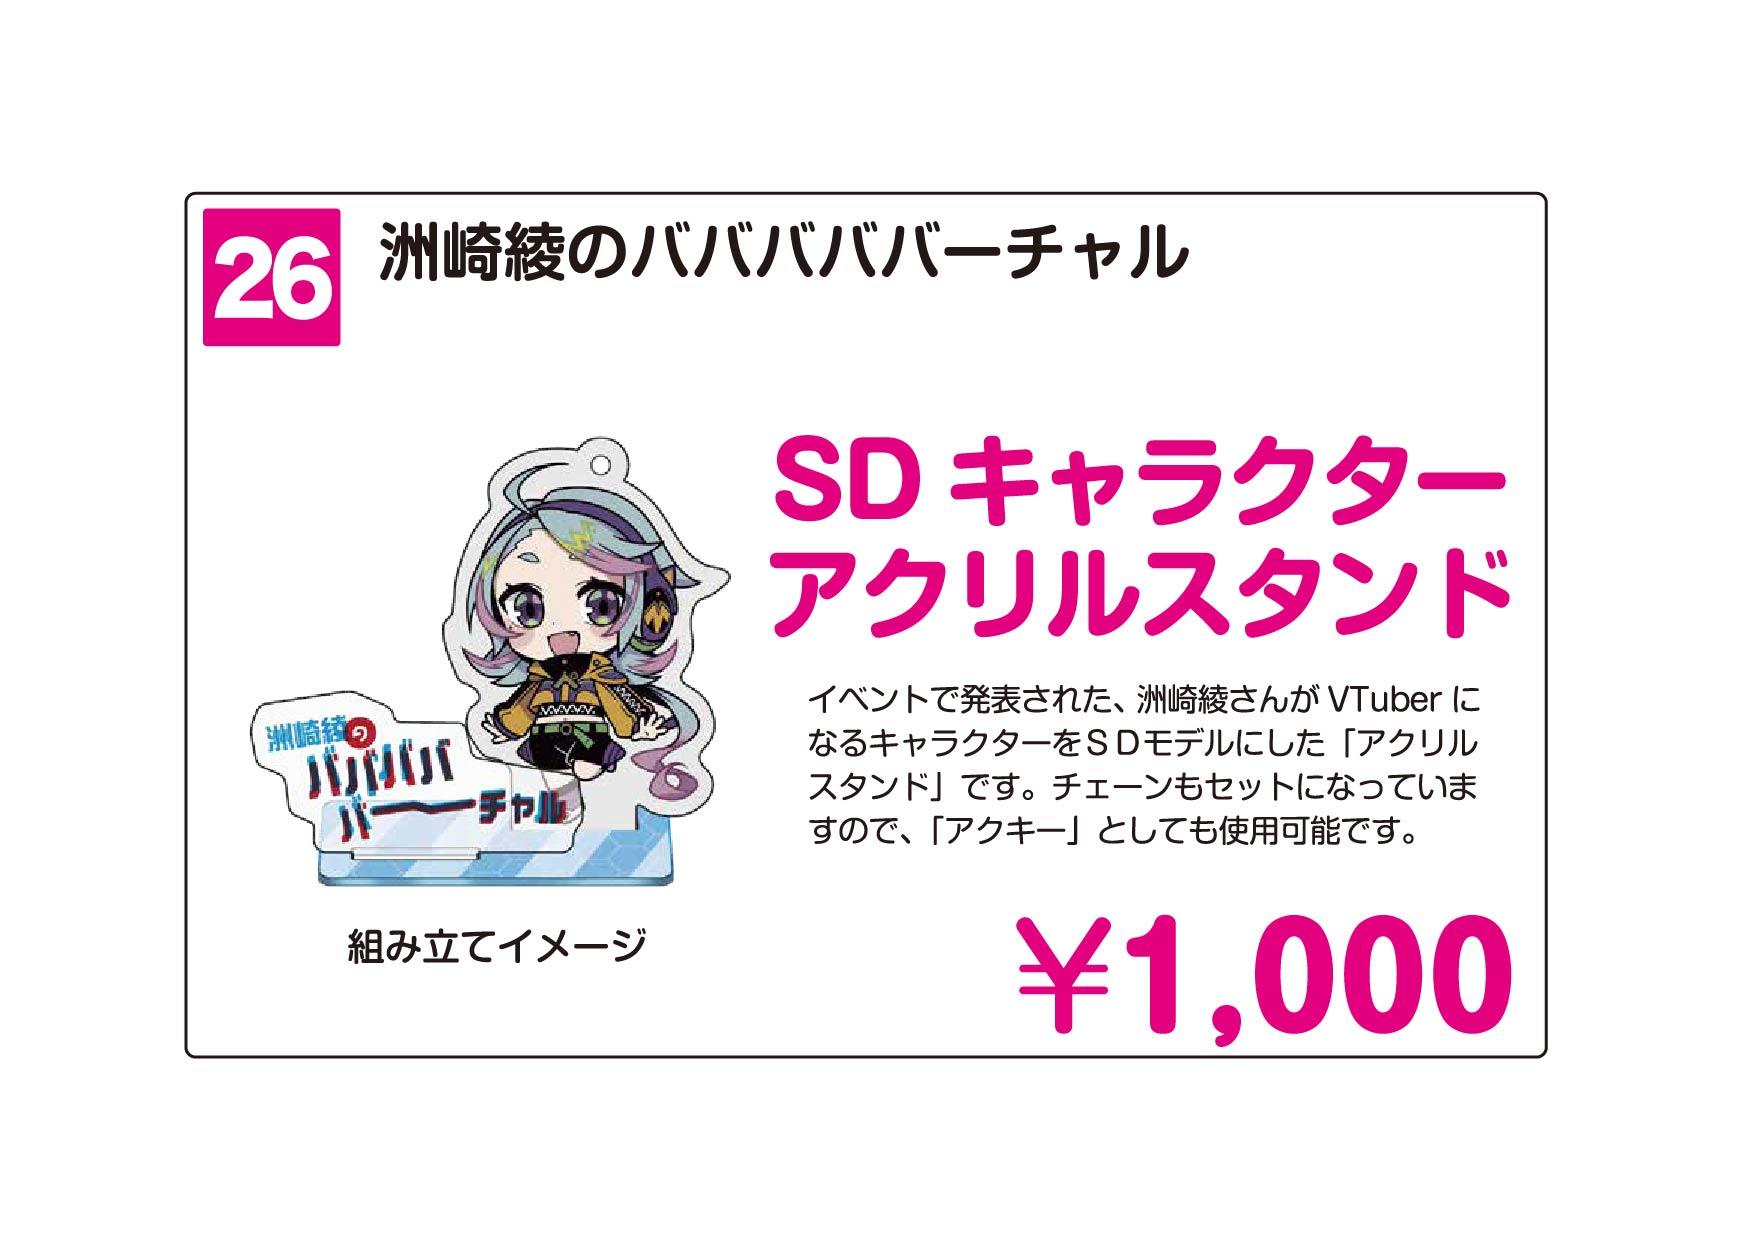 http://www.joqr.co.jp/AandG_booth/26.jpg